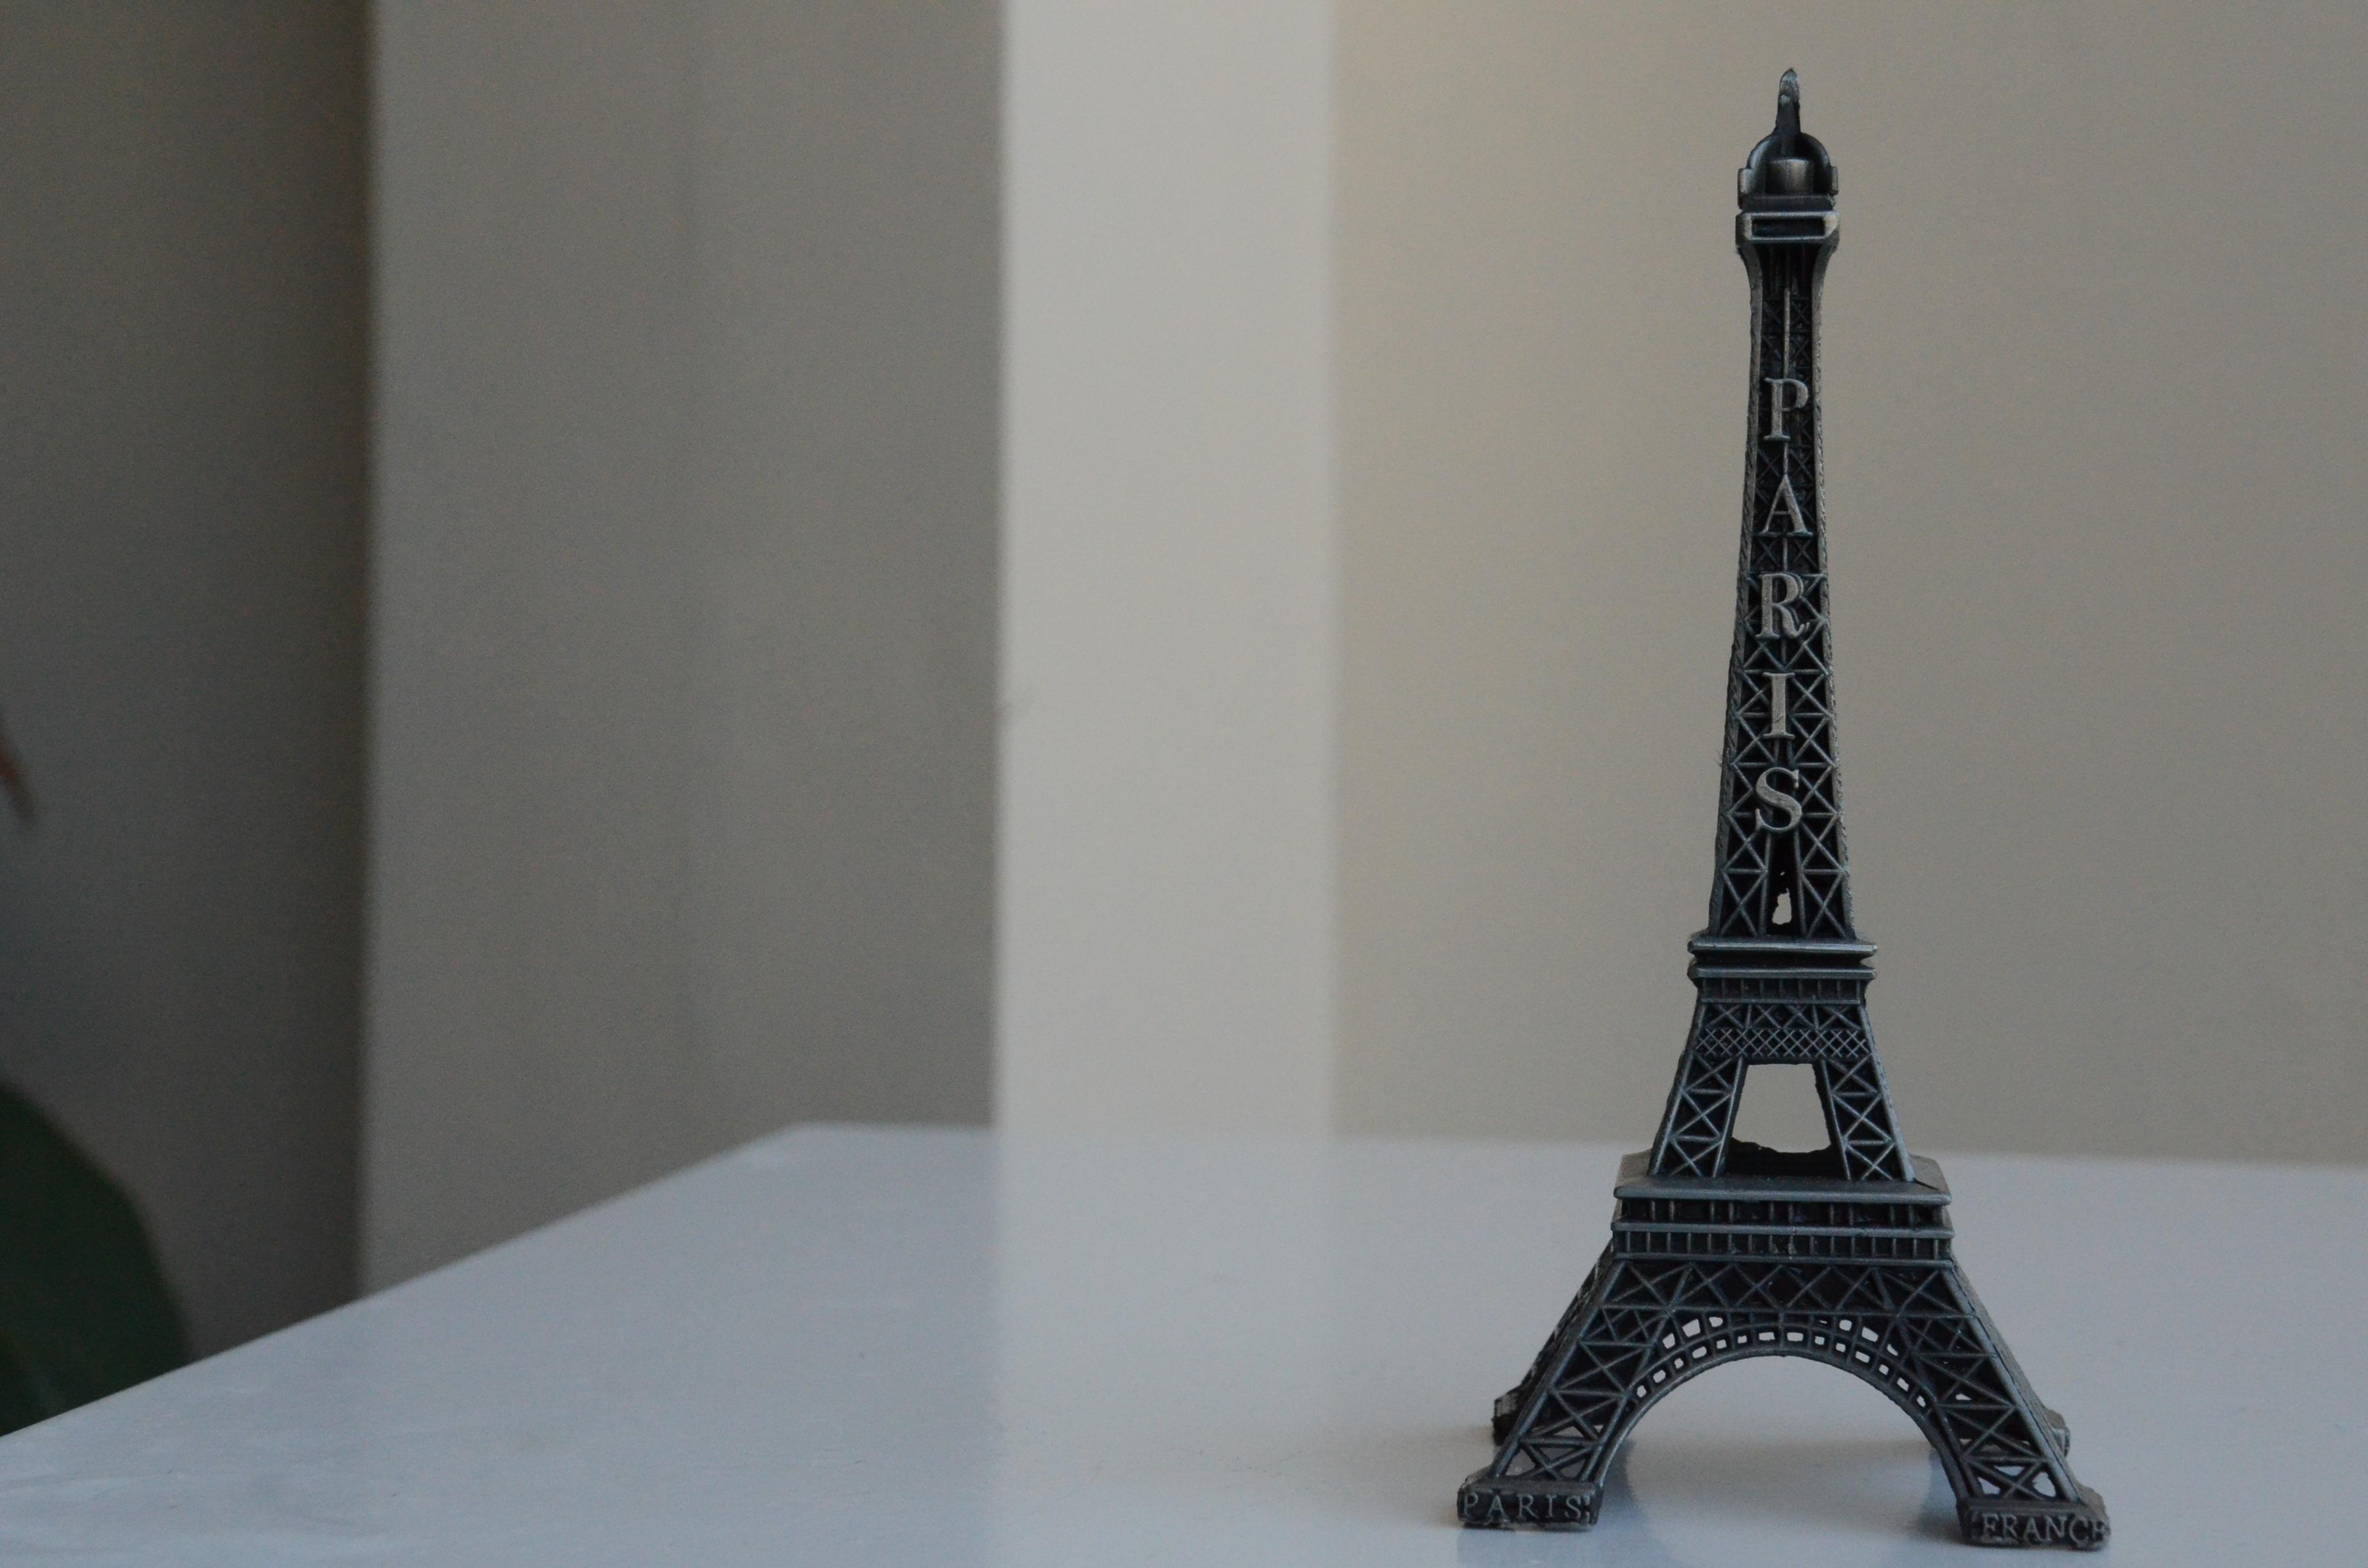 Fotos Gratis Torre Eiffel París Escultura Art Diseño